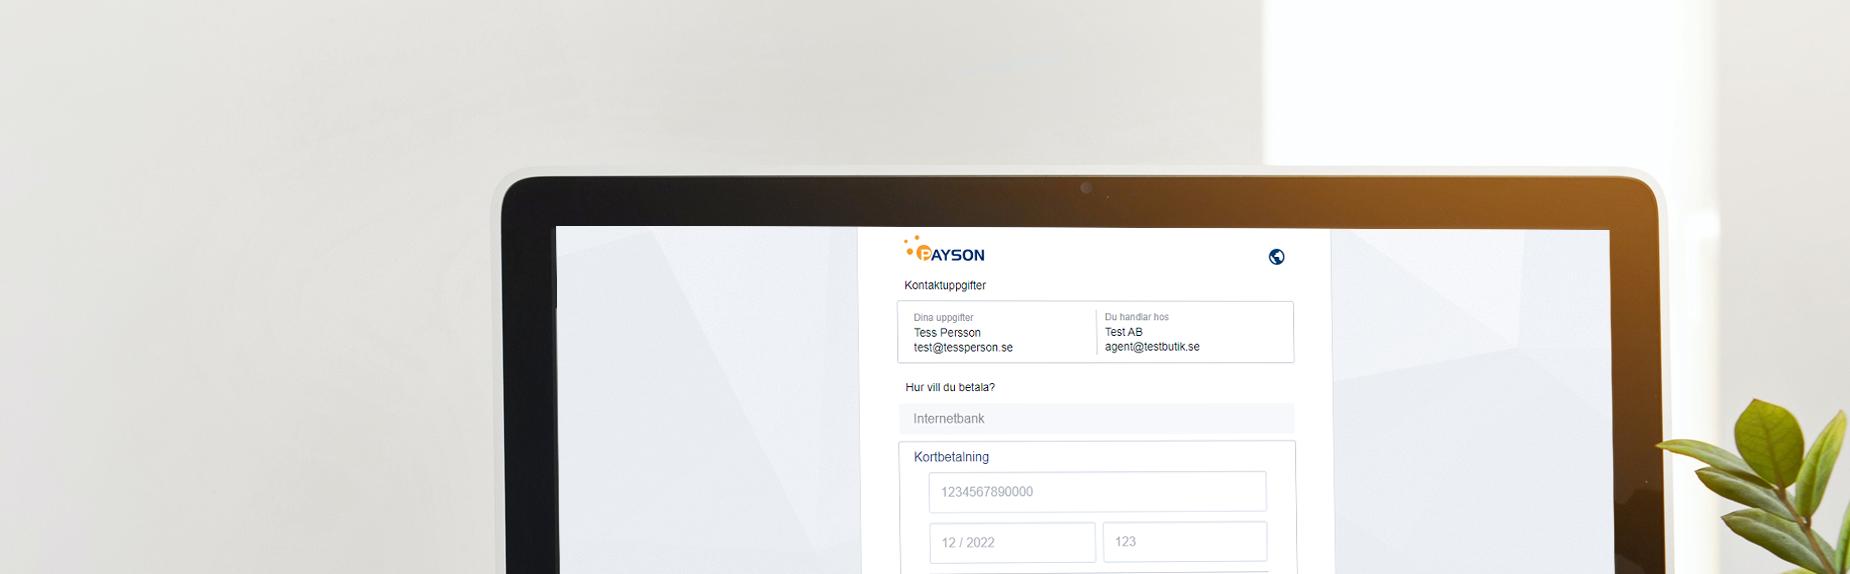 Nyhet: ny design på Payson 1.0!